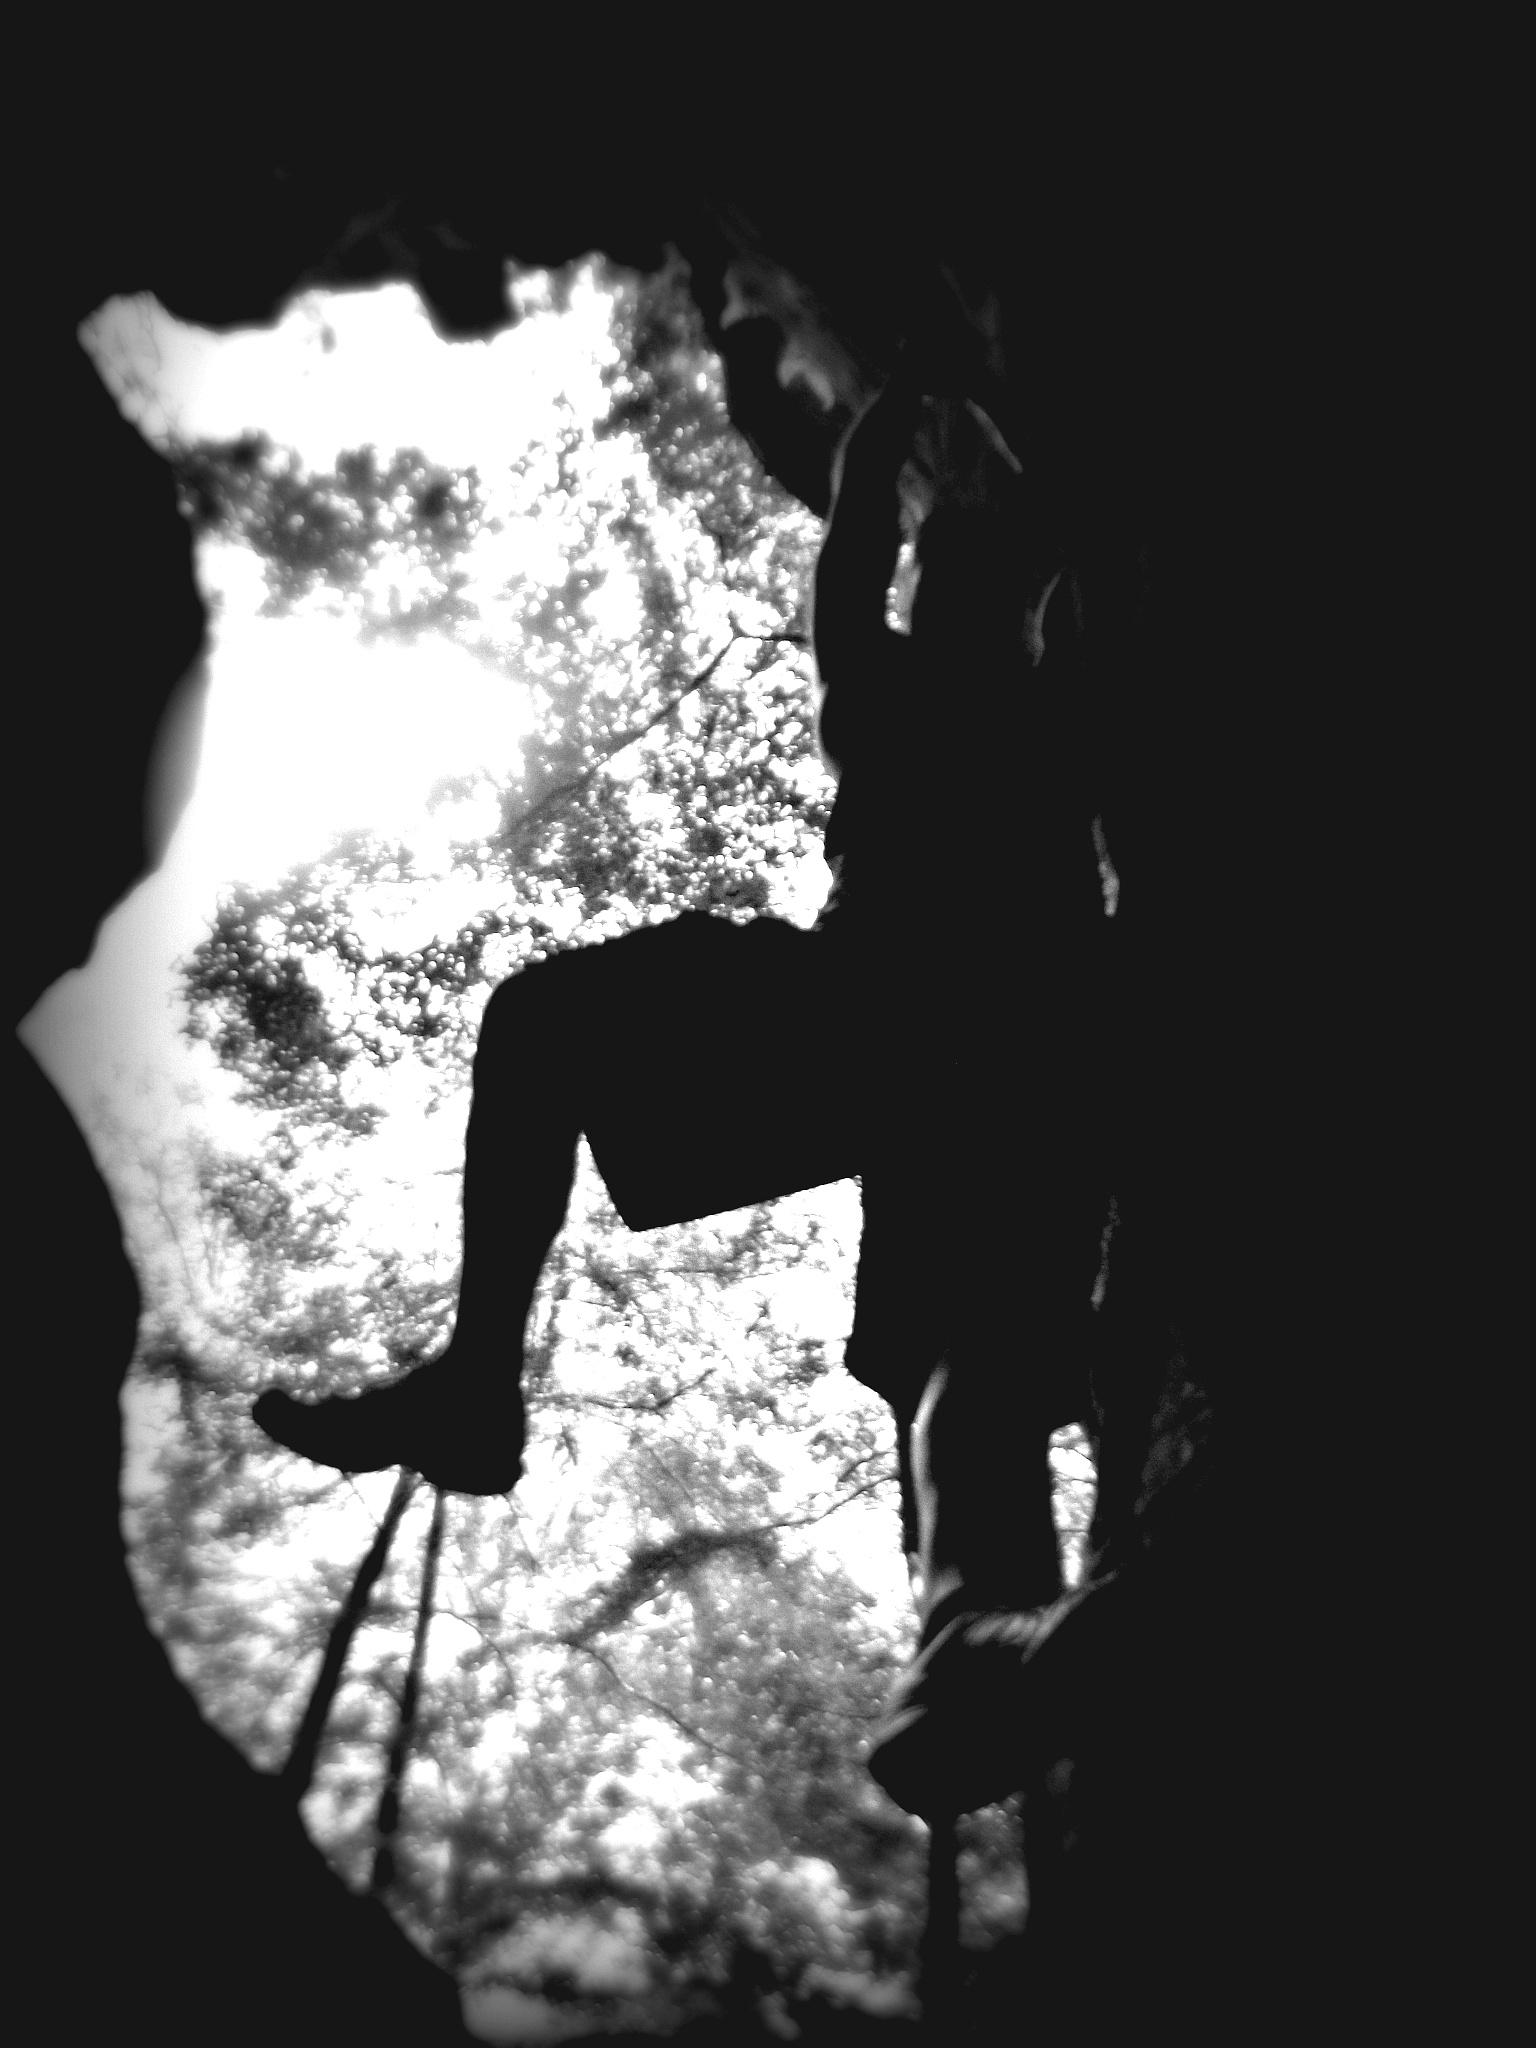 Silhouette by Melissa Berro